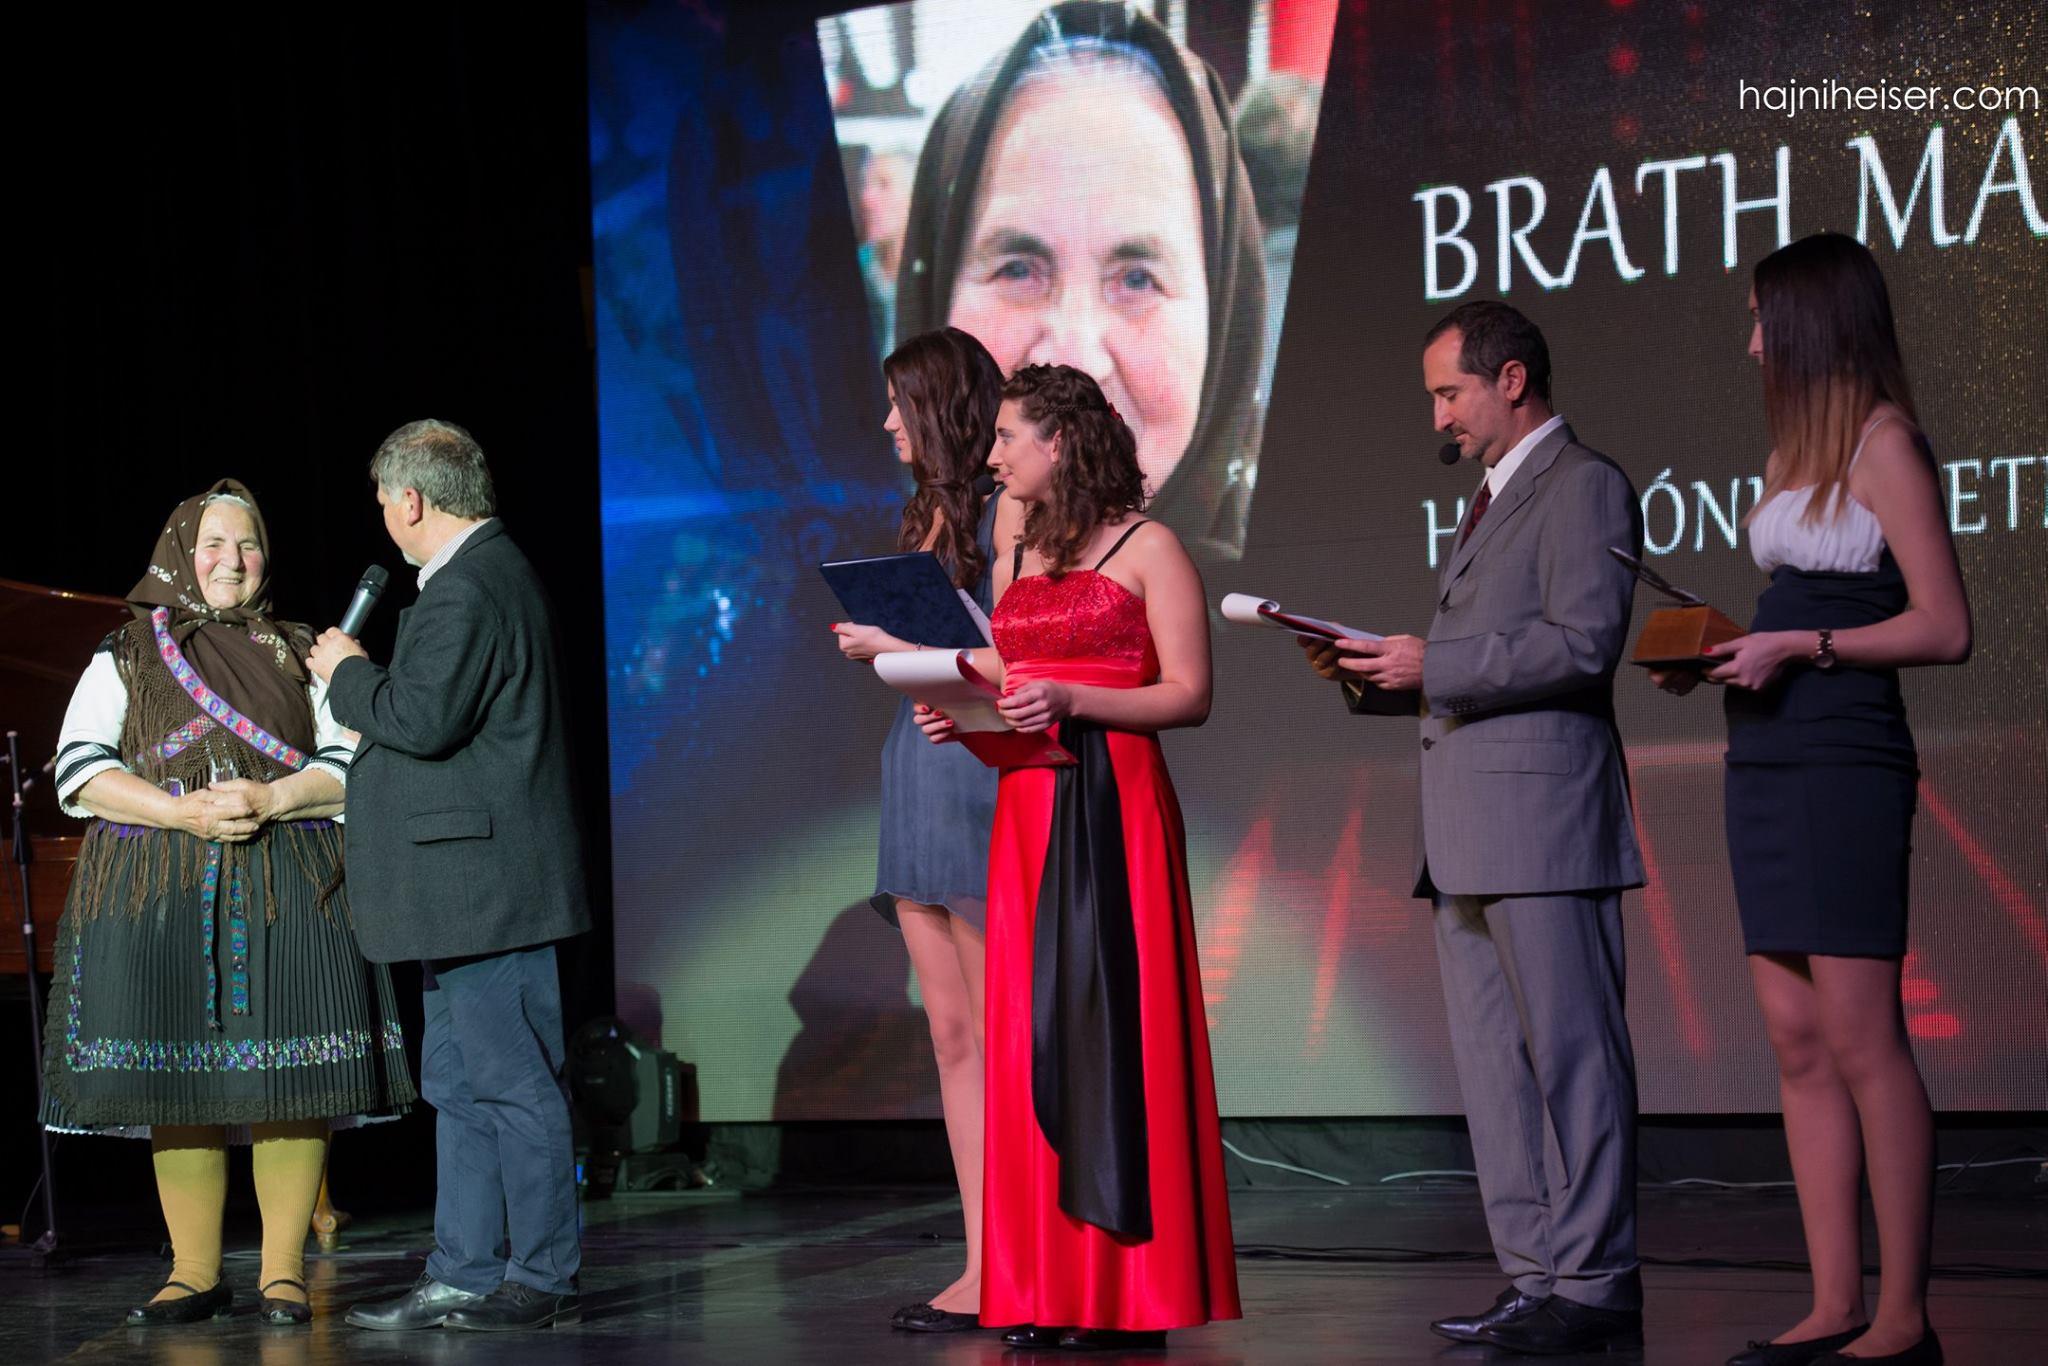 harmonia-dij-brath-margit-2016